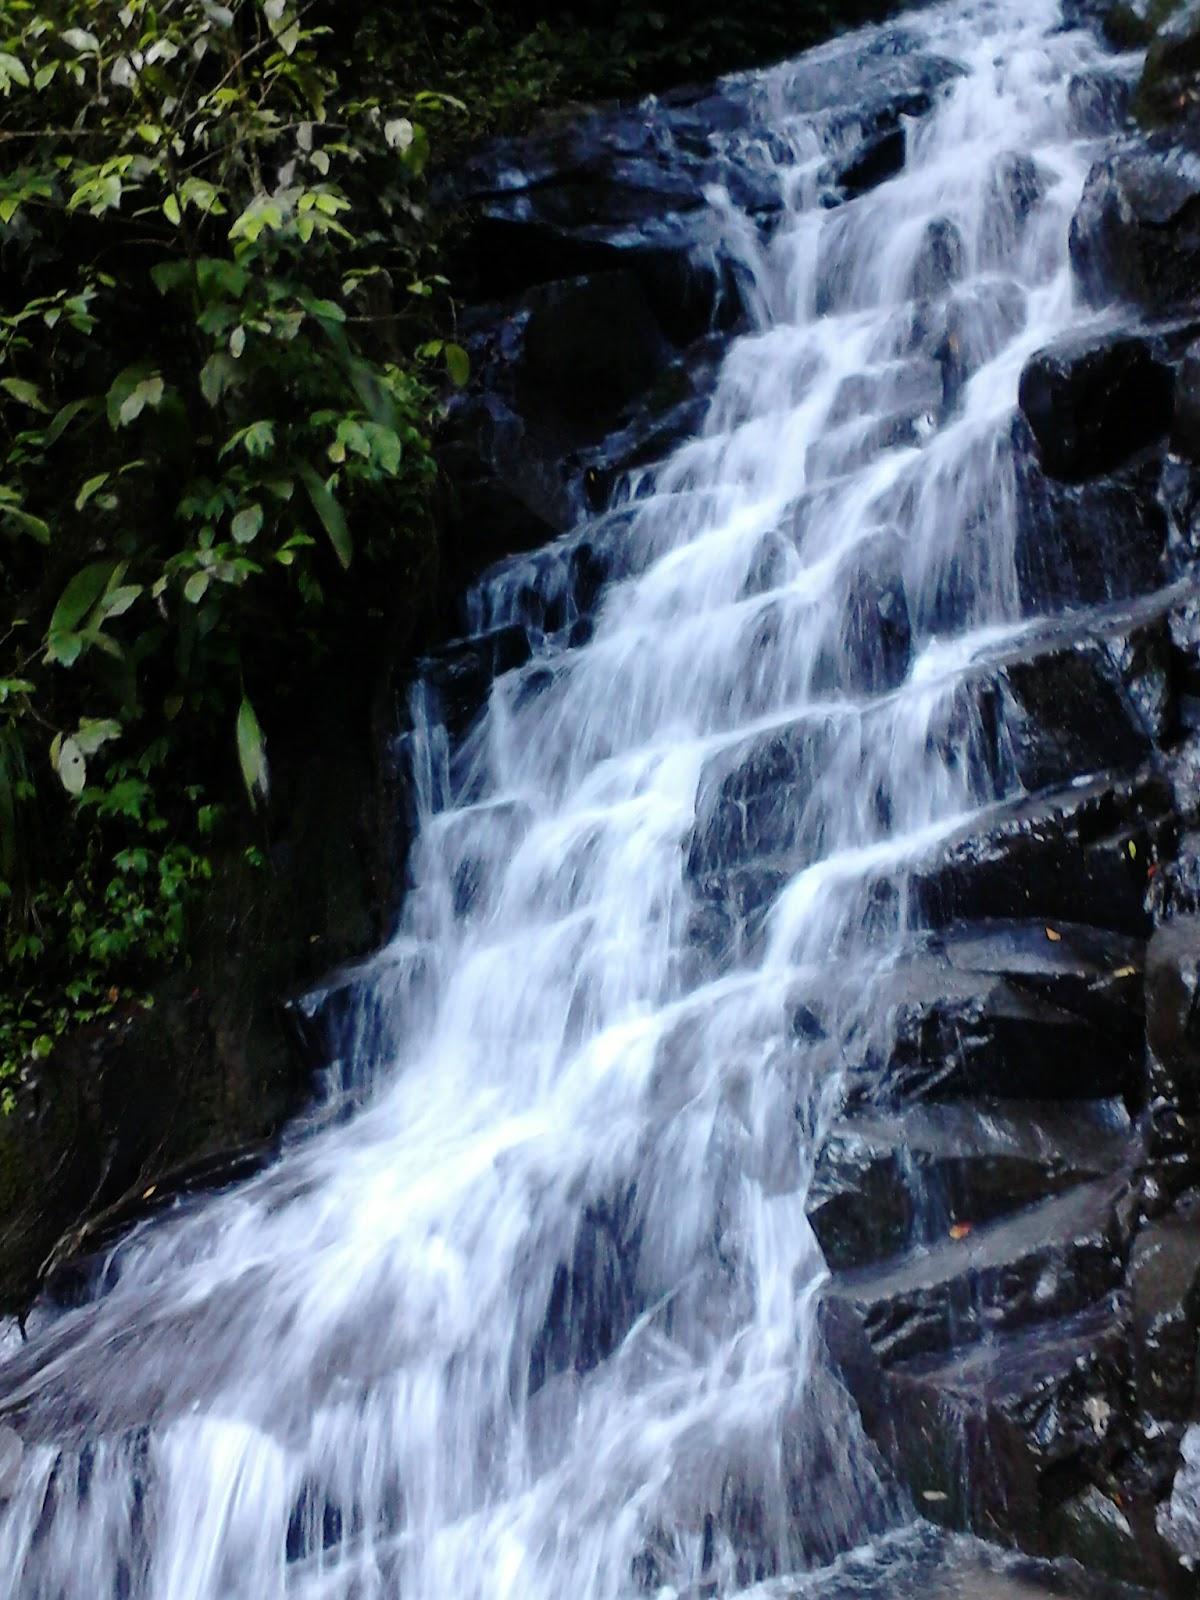 Air Terjun Irenggolo , Nikmati Godaan Dari Gemericiknya Aliran Air